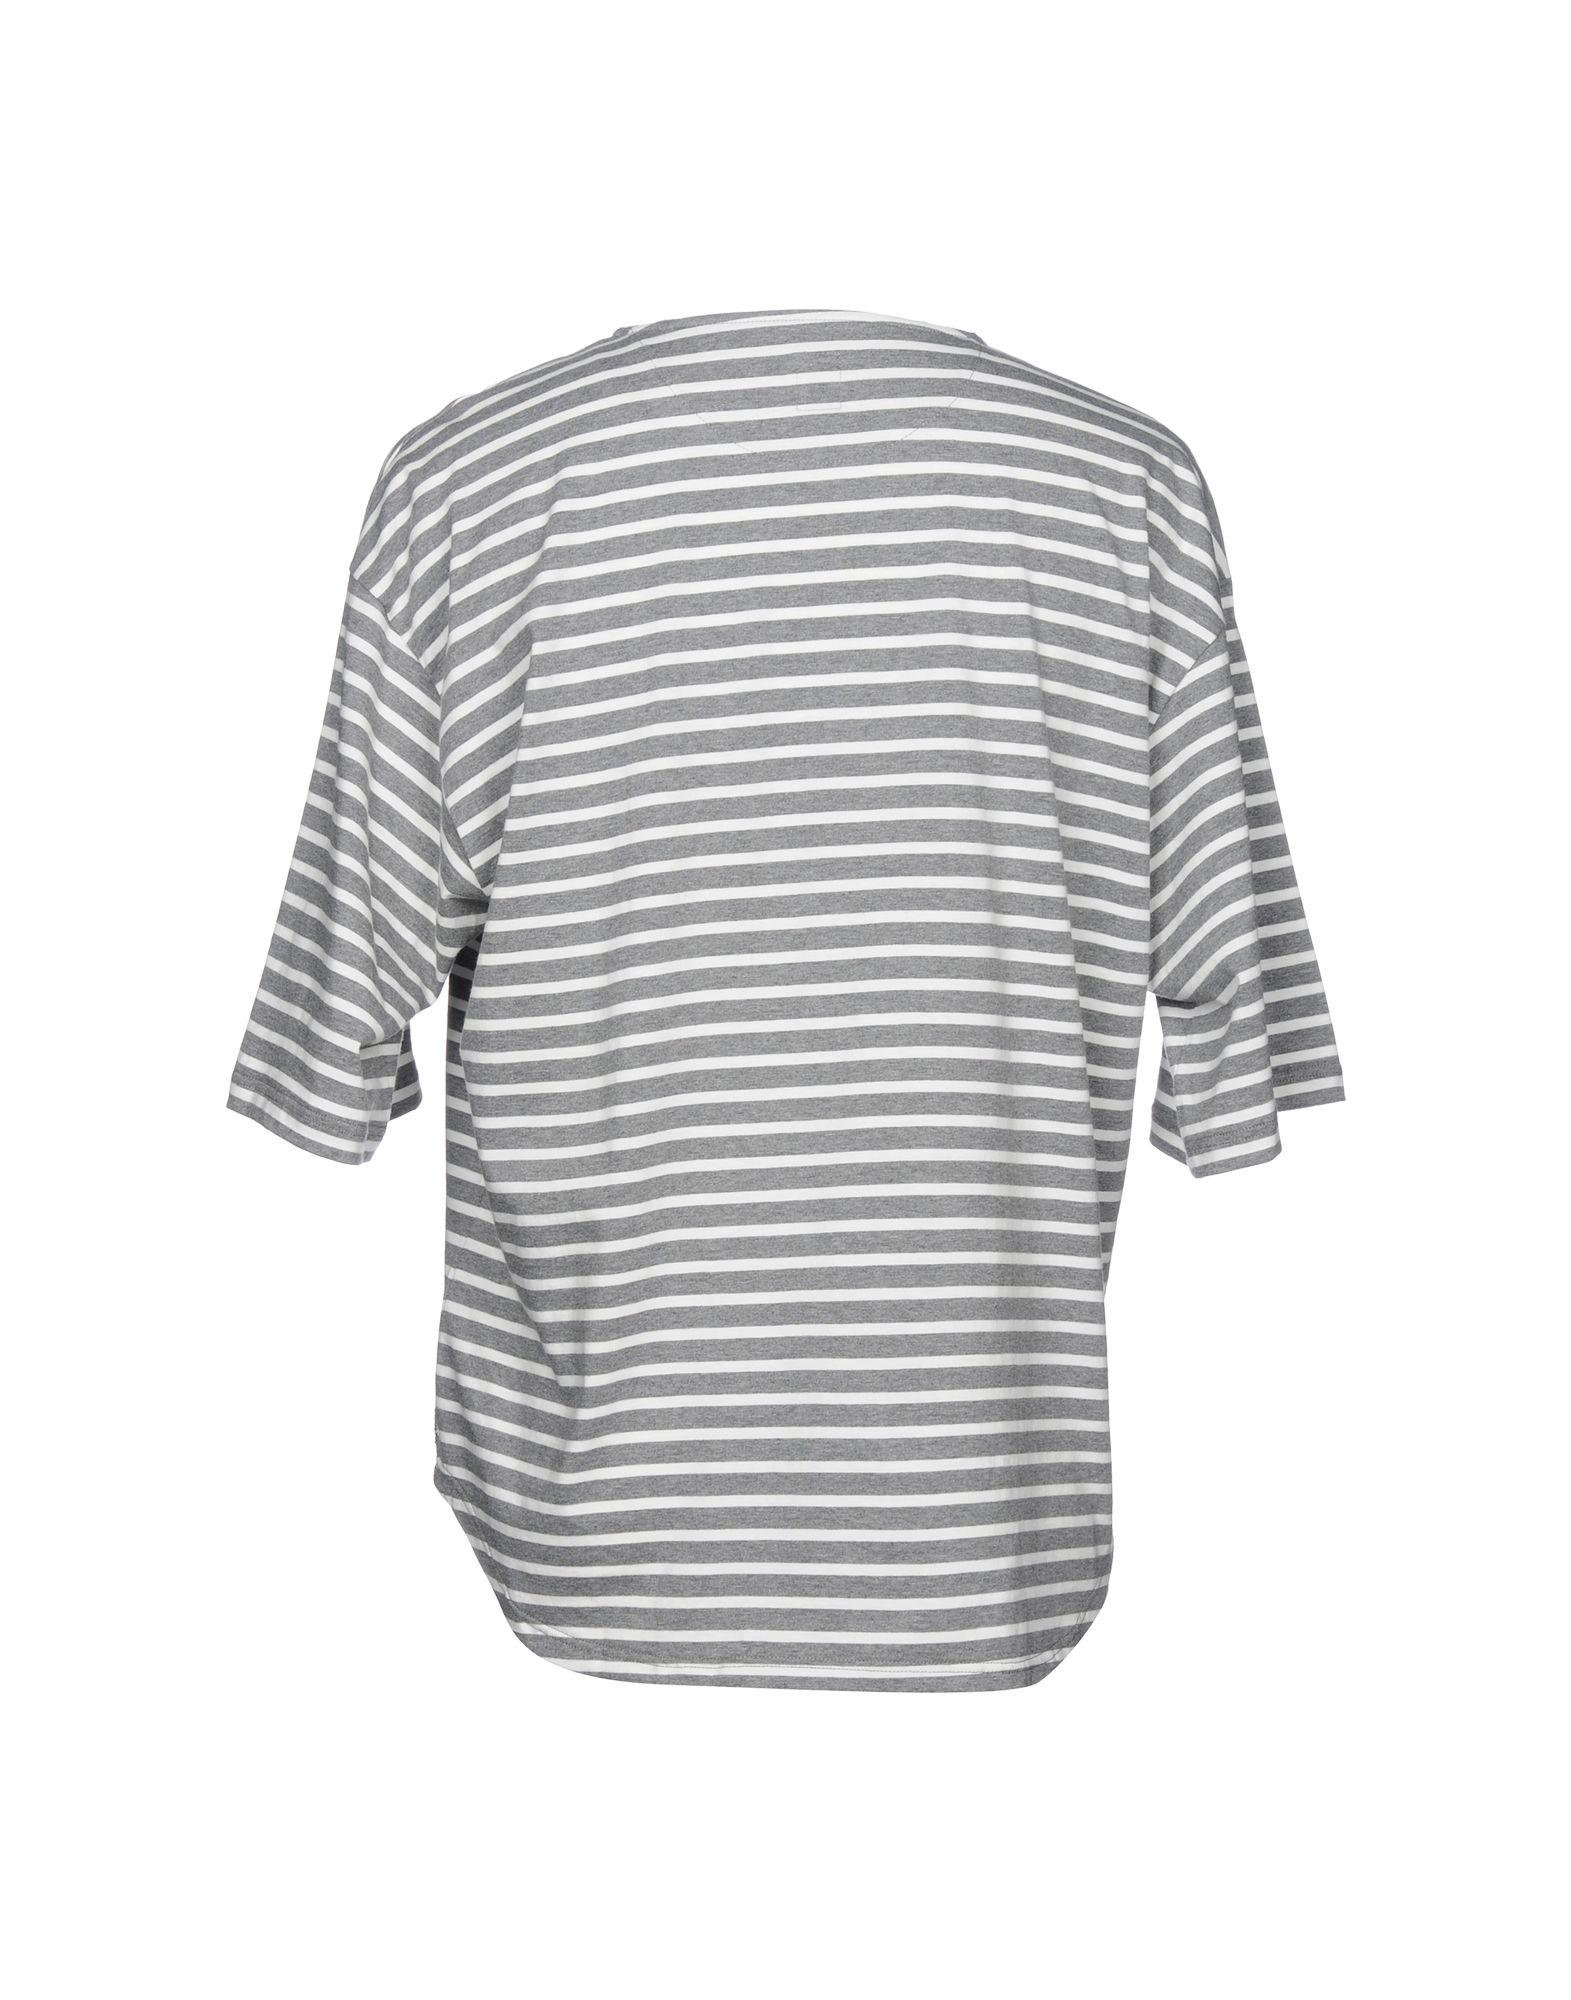 A - buon mercato A buon mercato T-Shirt Eleventy Uomo - A 12174798KT 564851